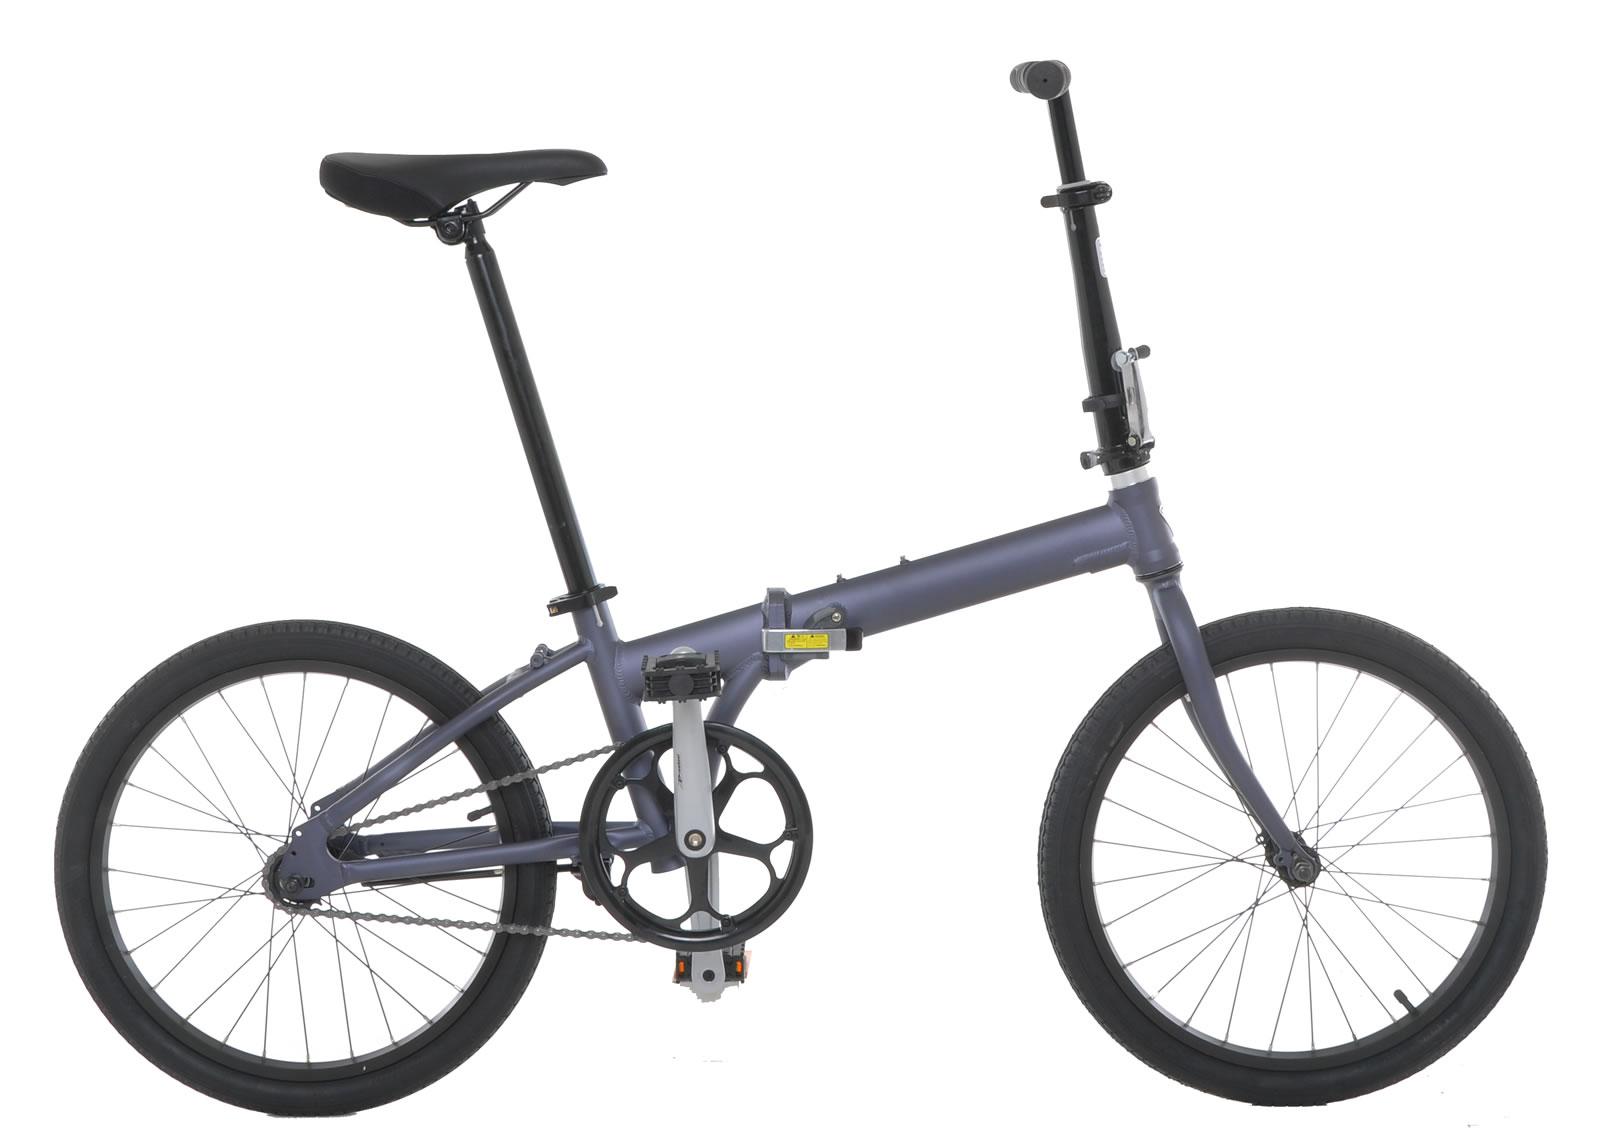 Vilano Urbana Single Speed Folding Bike $180